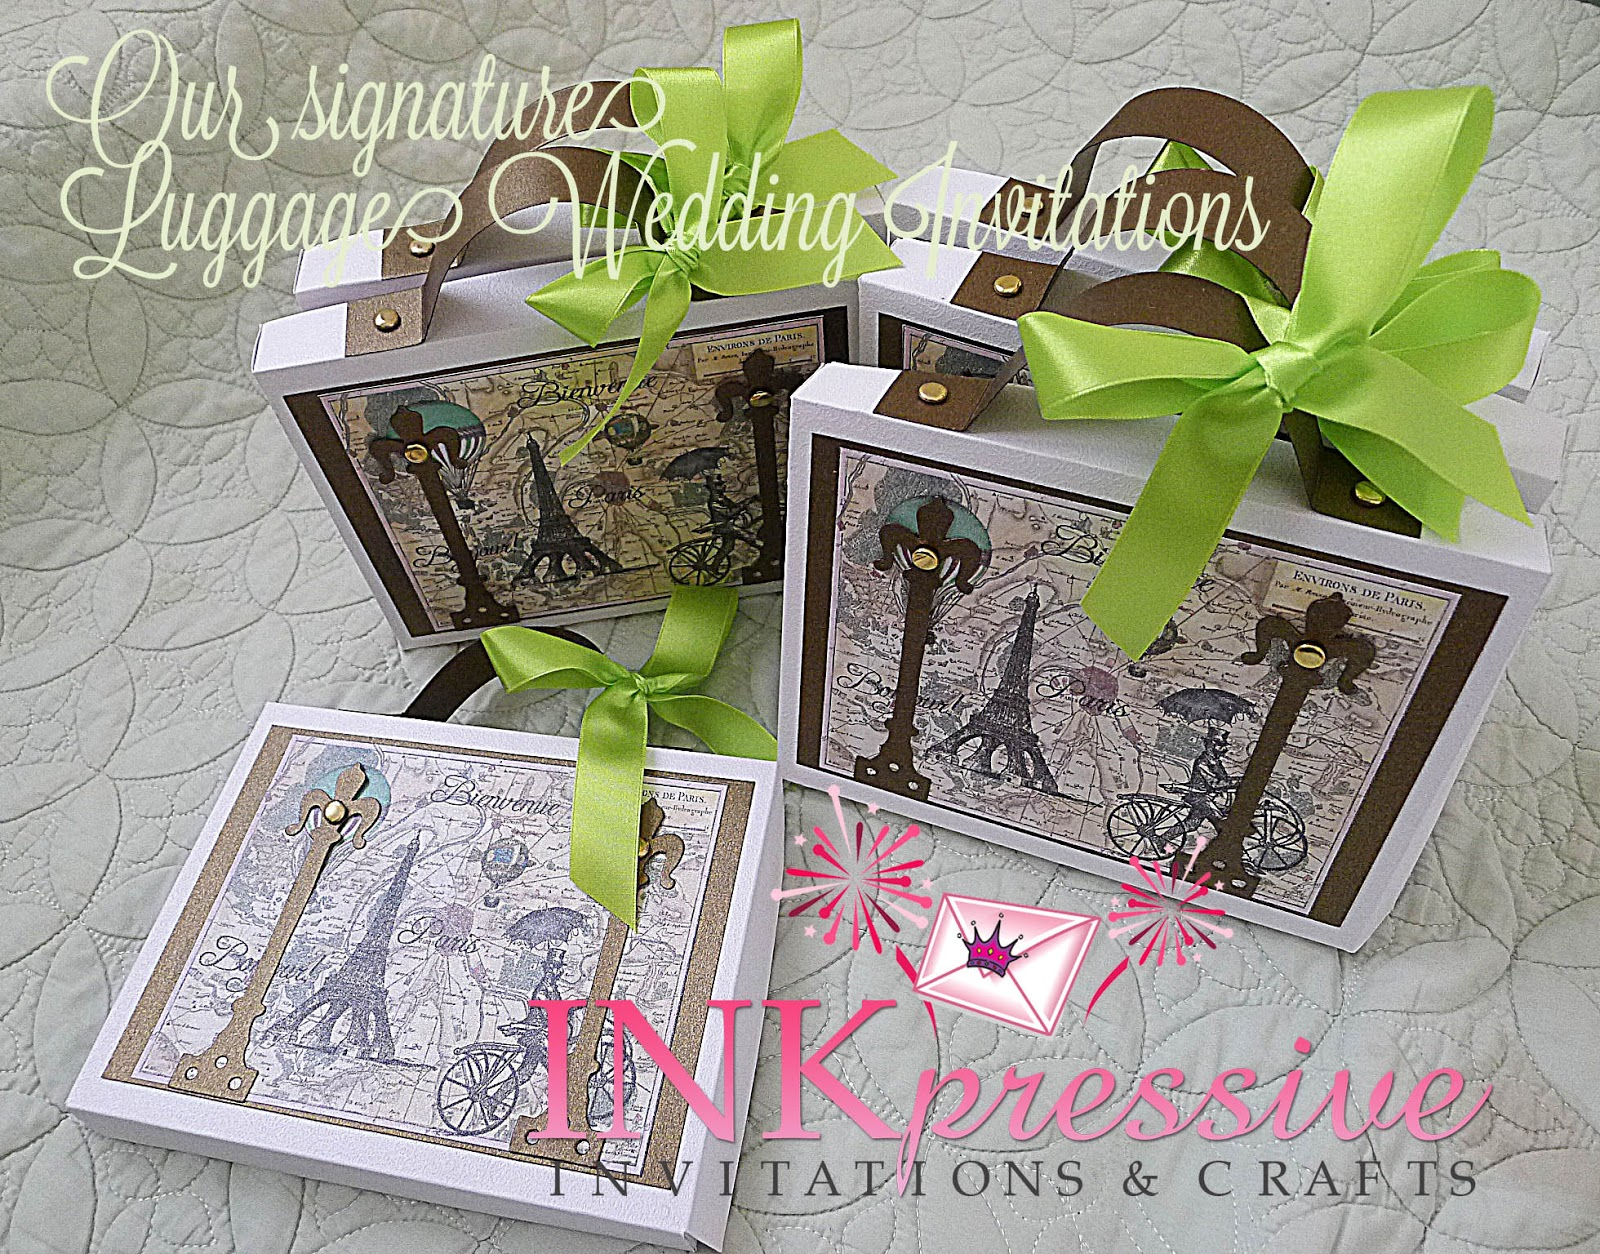 Up Themed Wedding Invitations: Travel Theme Wedding Invitation Suitcase